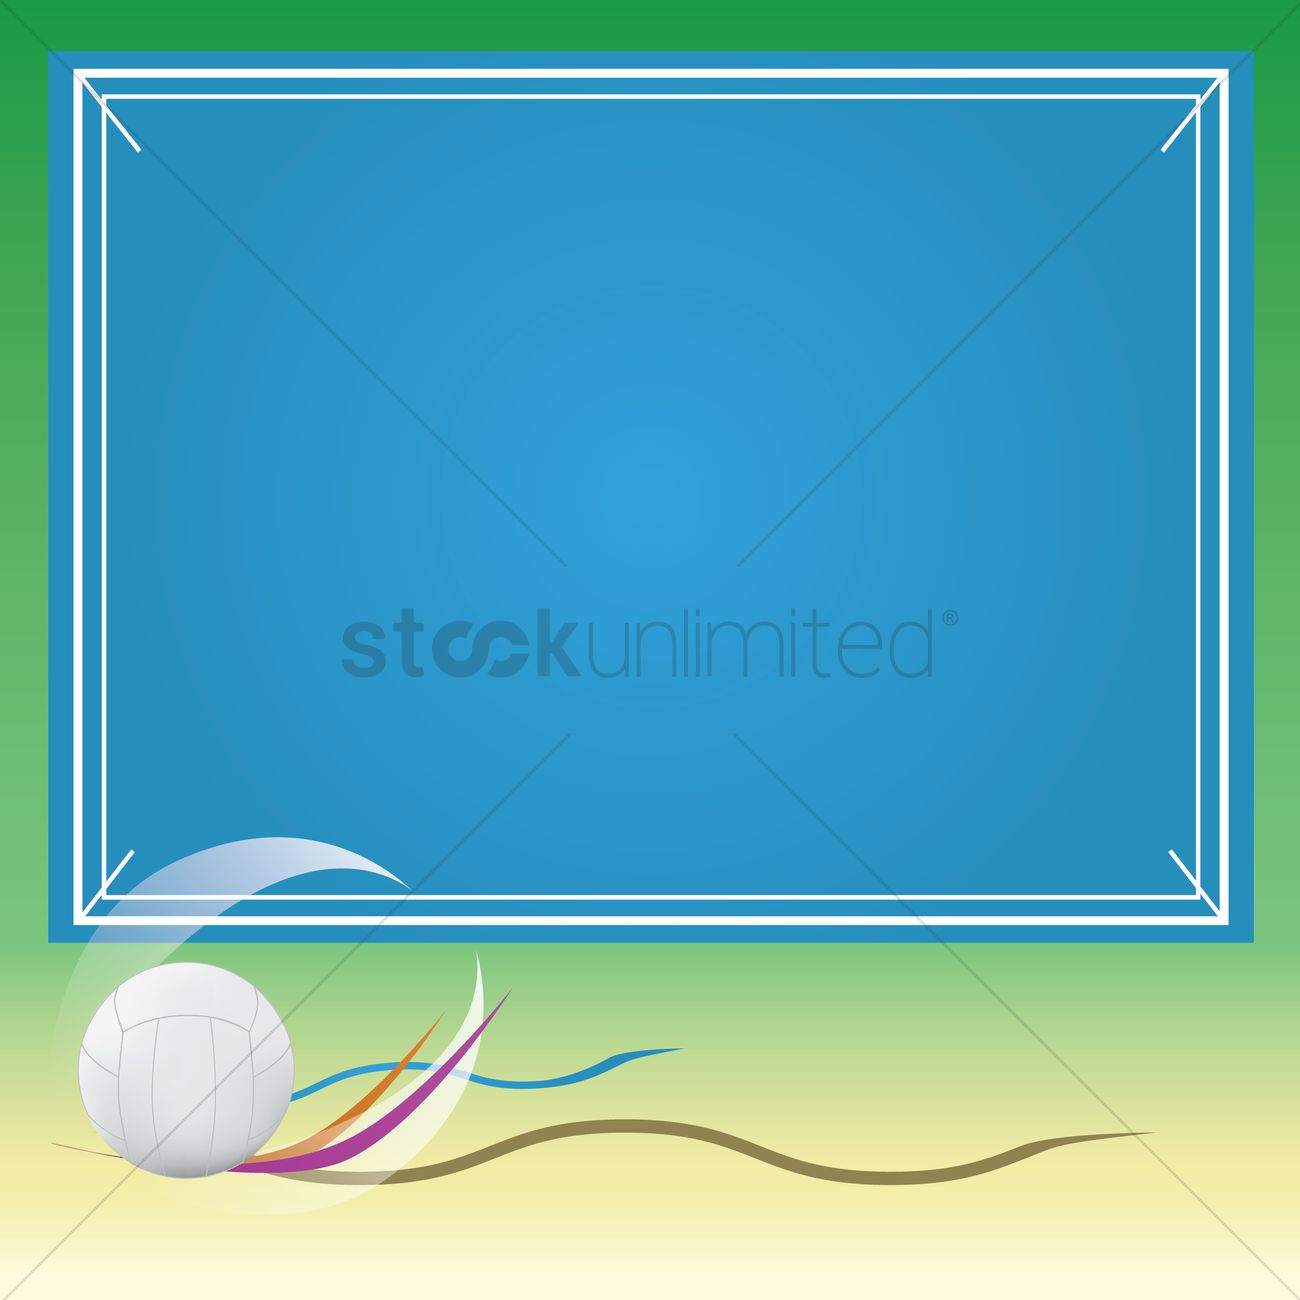 volleyball template josemulinohouseco